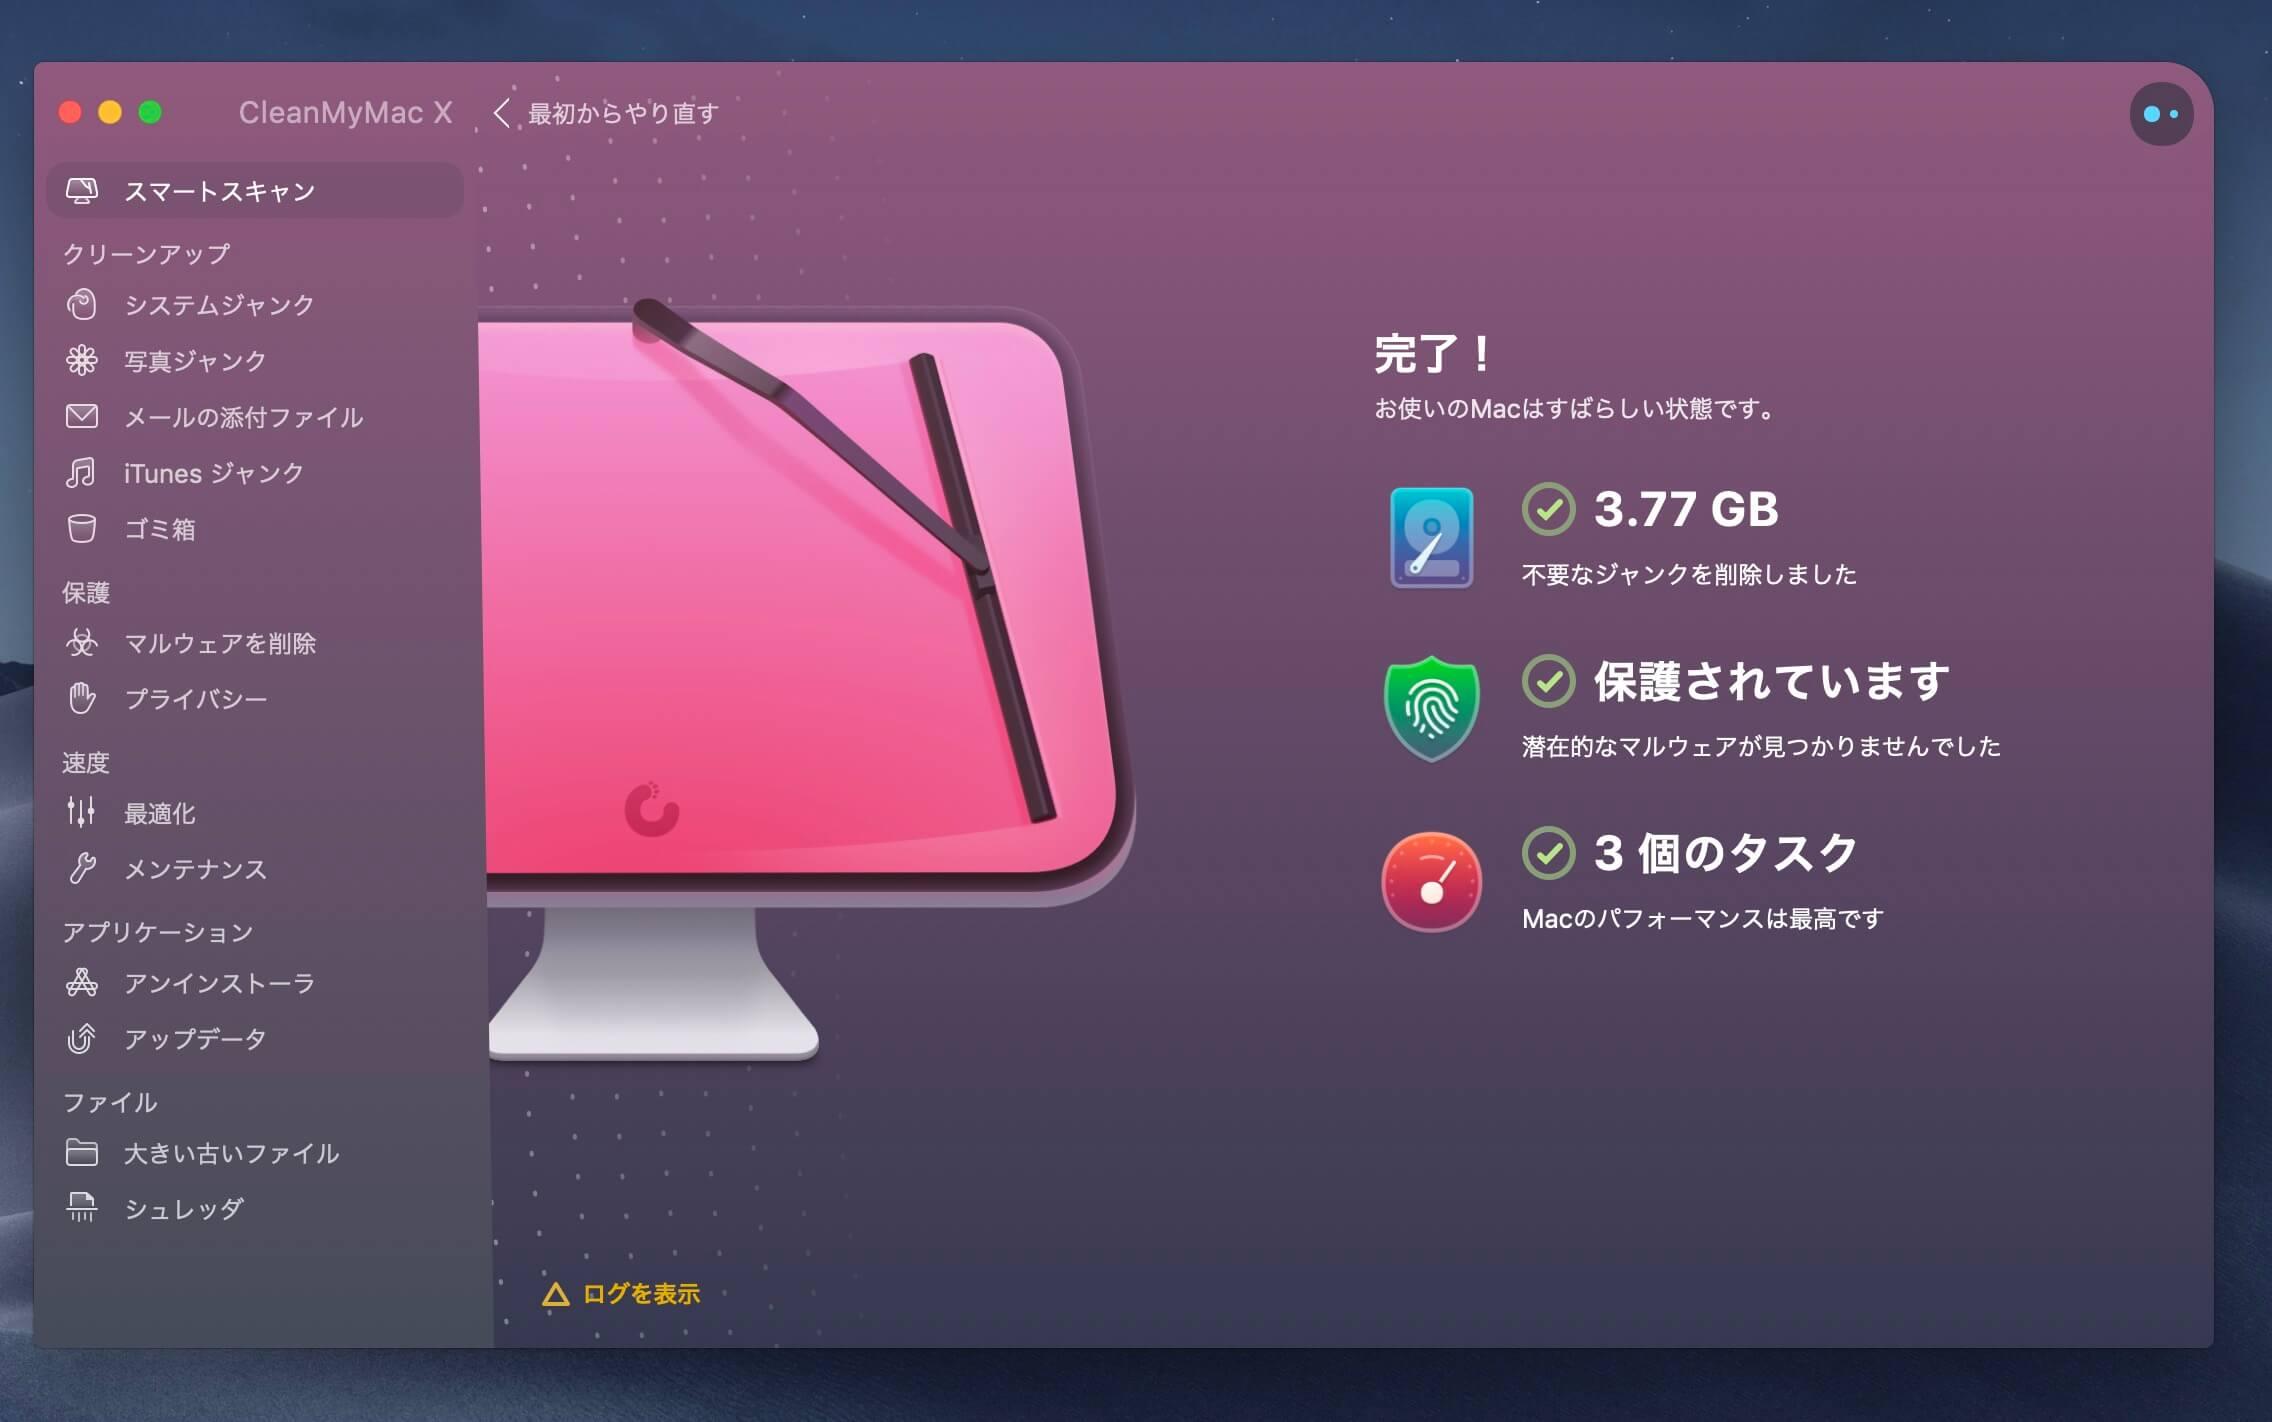 Setappで使えるアプリ!CleanMyMacでmacをメンテナンス!